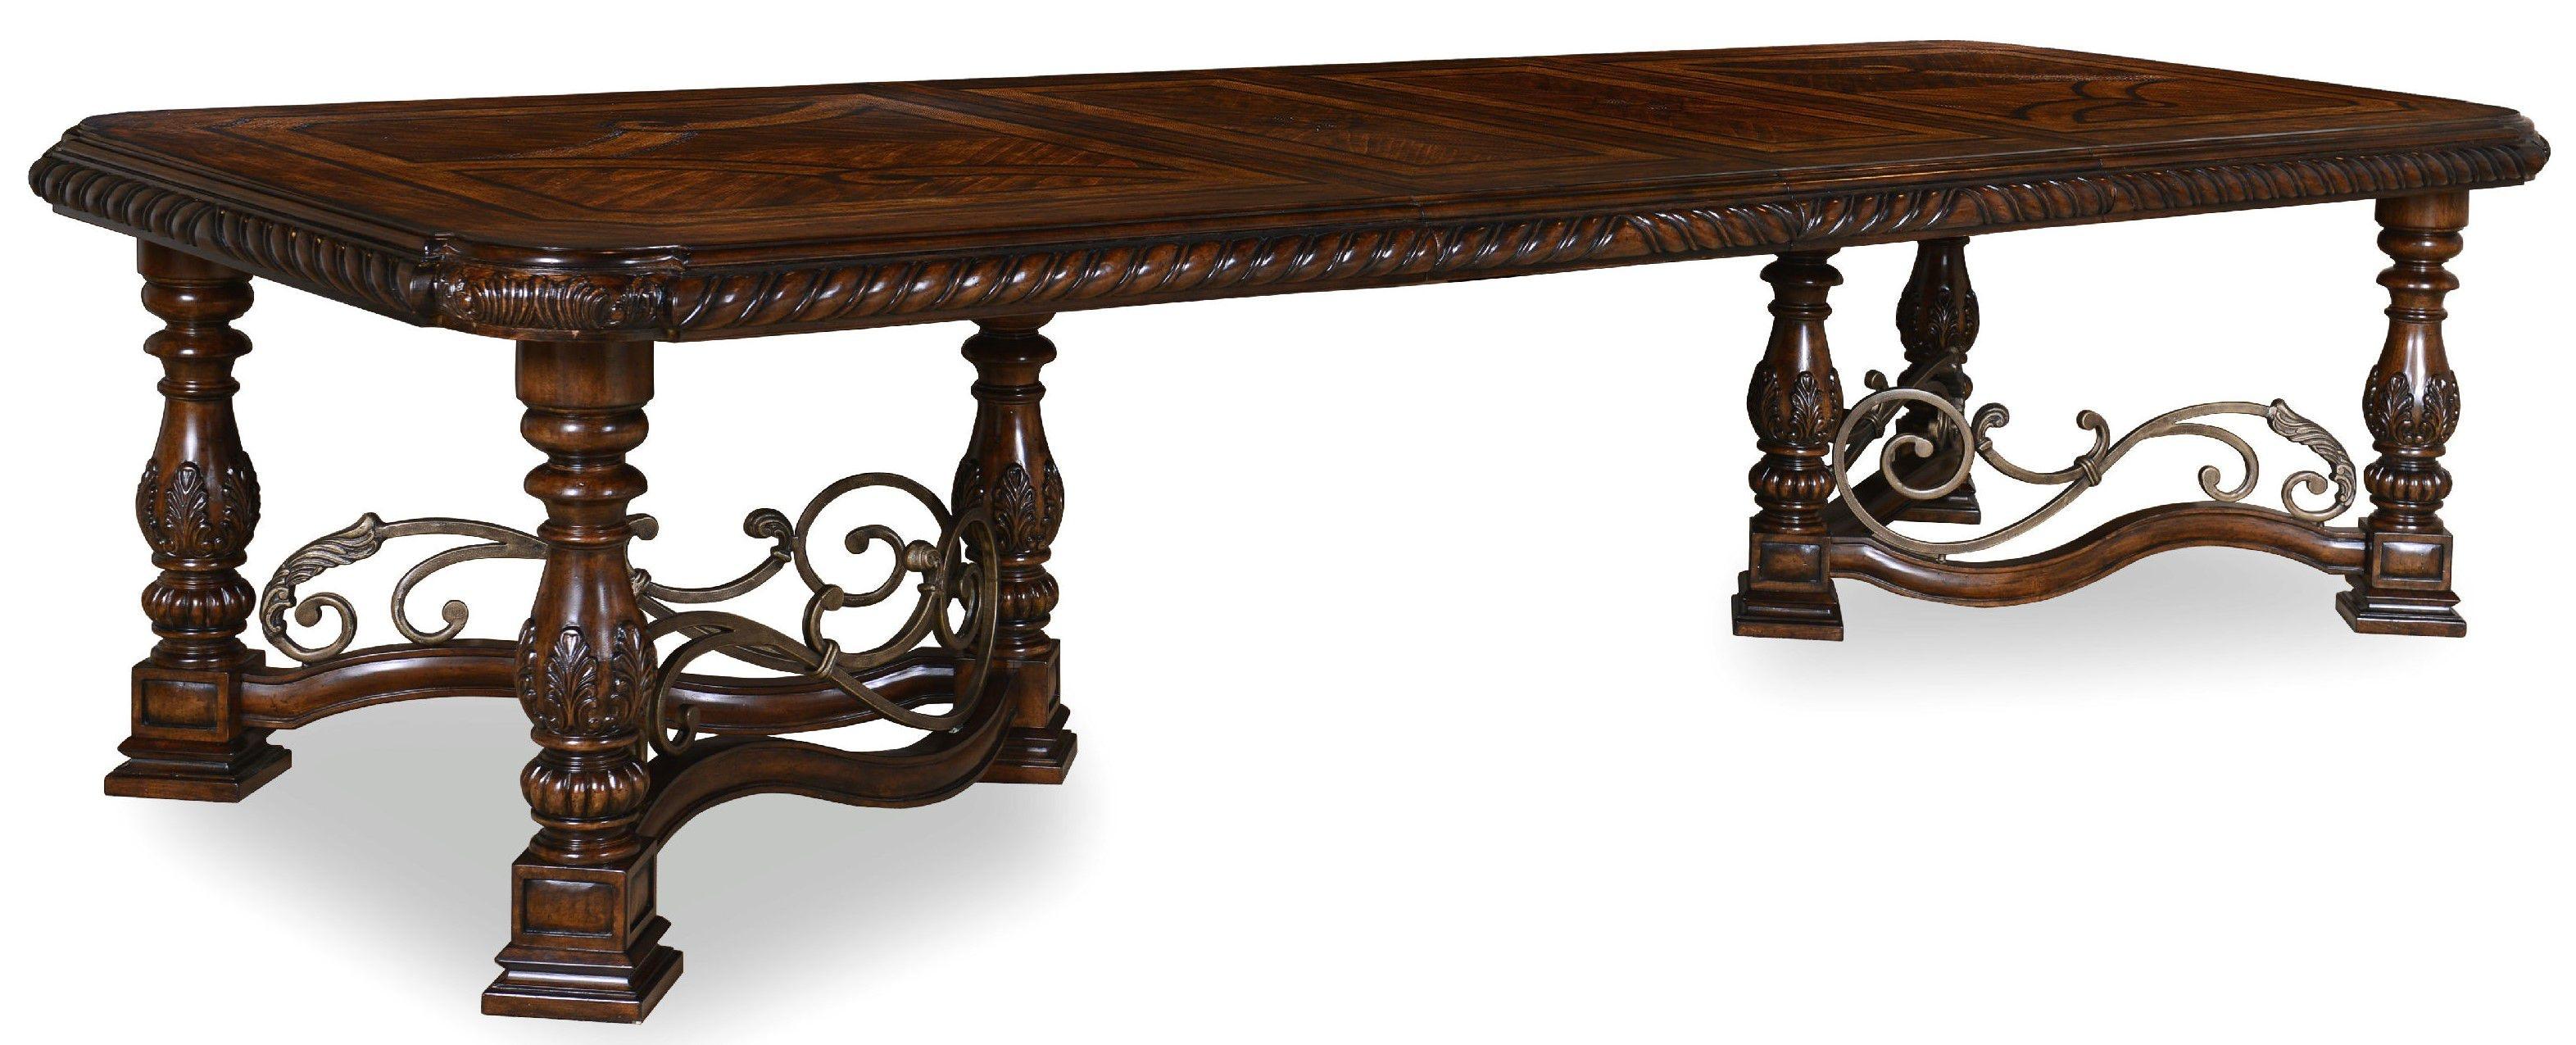 ART Furniture Dining Room Trestle Dining Table Top 209221  : 209221 2304sl1 from www.kemperhomefurnishings.com size 1024 x 768 jpeg 39kB